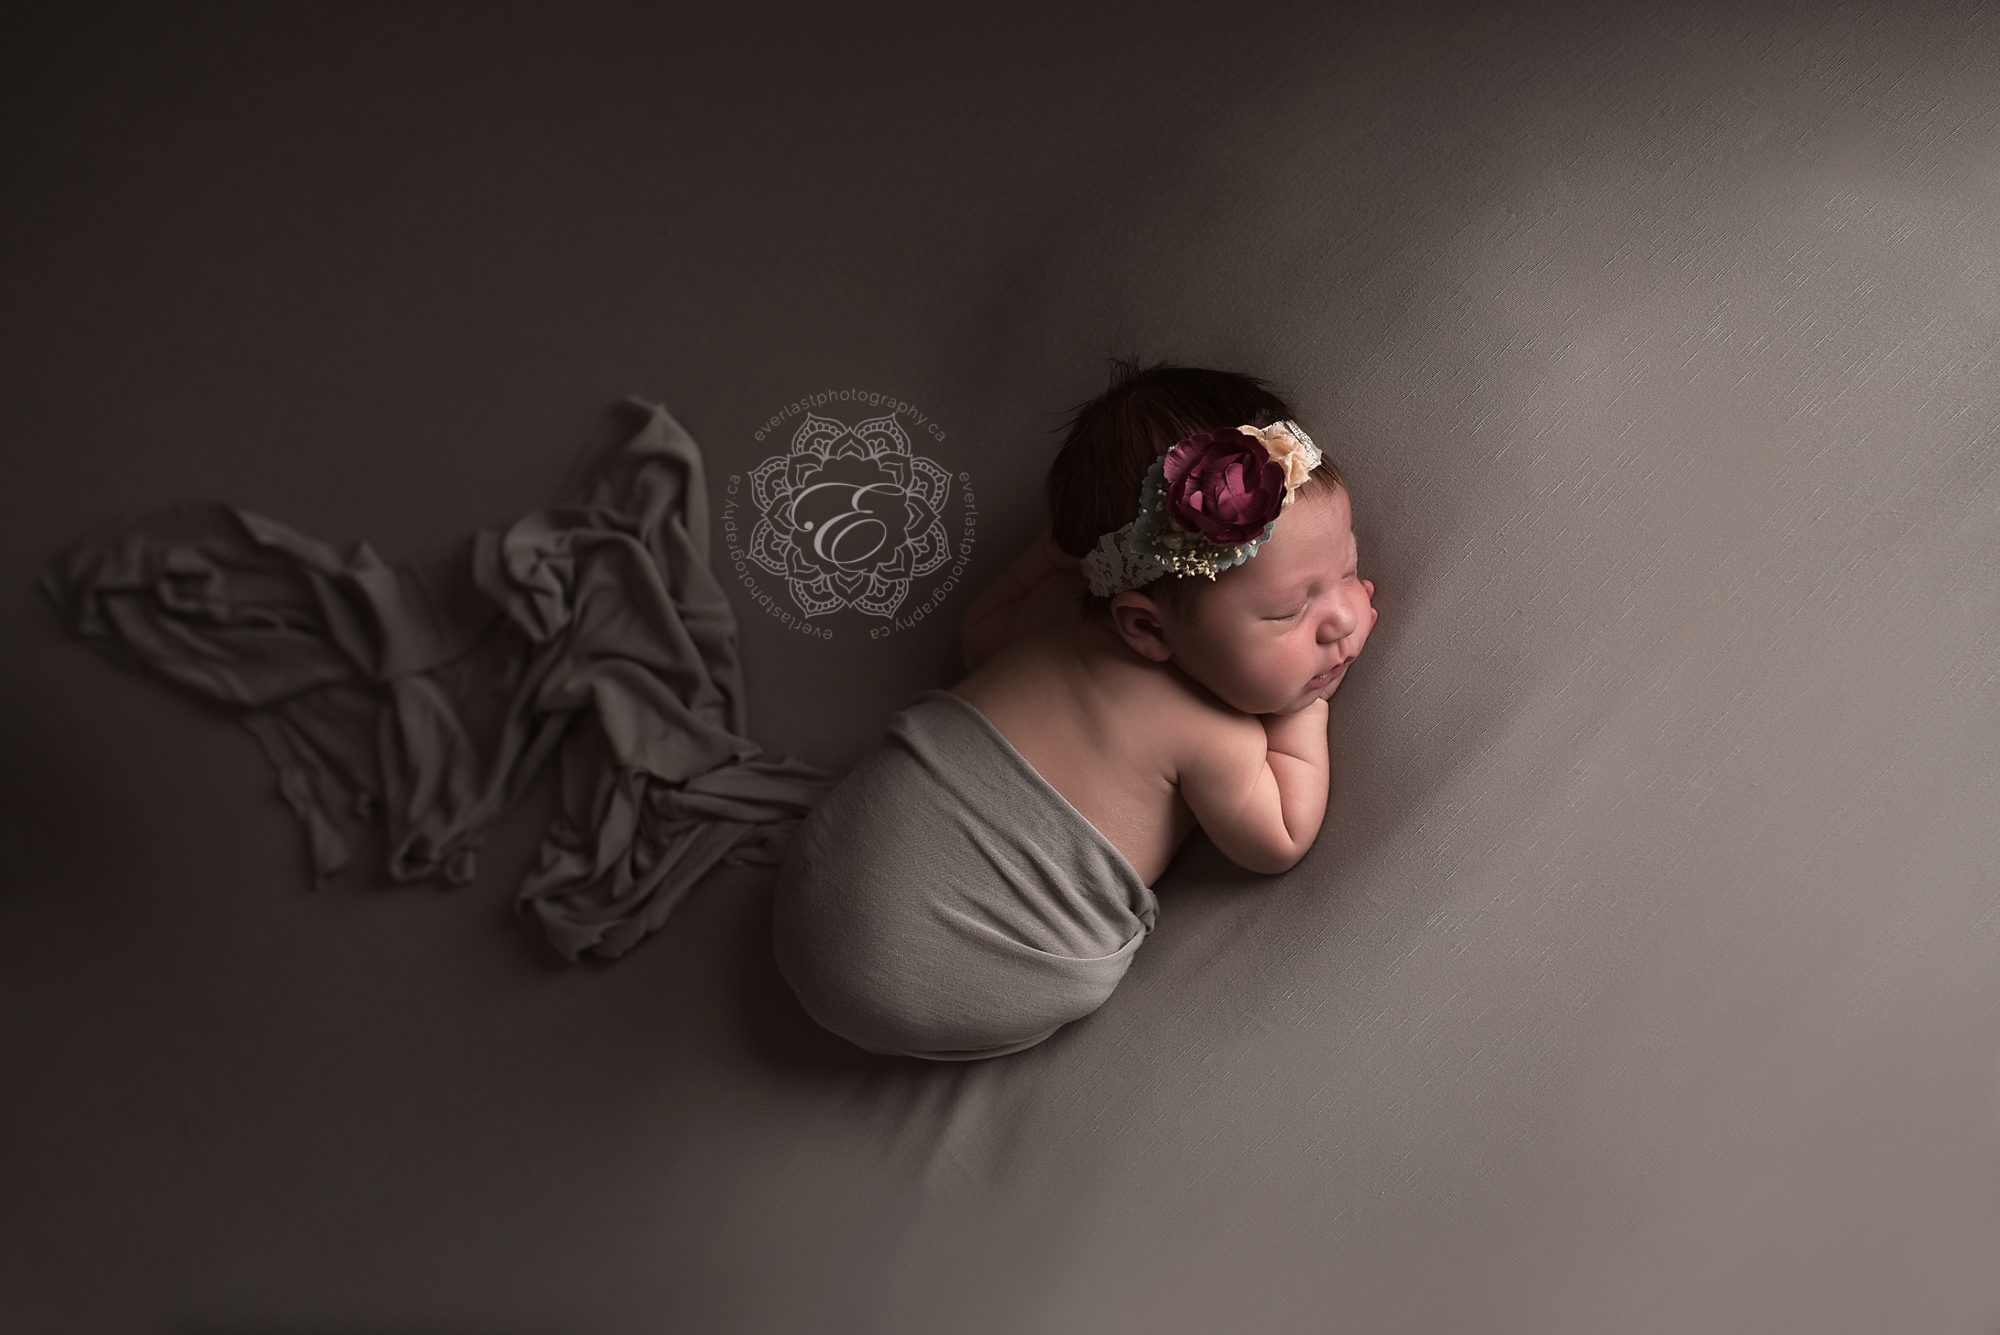 edmonton-photography-studios-newborn